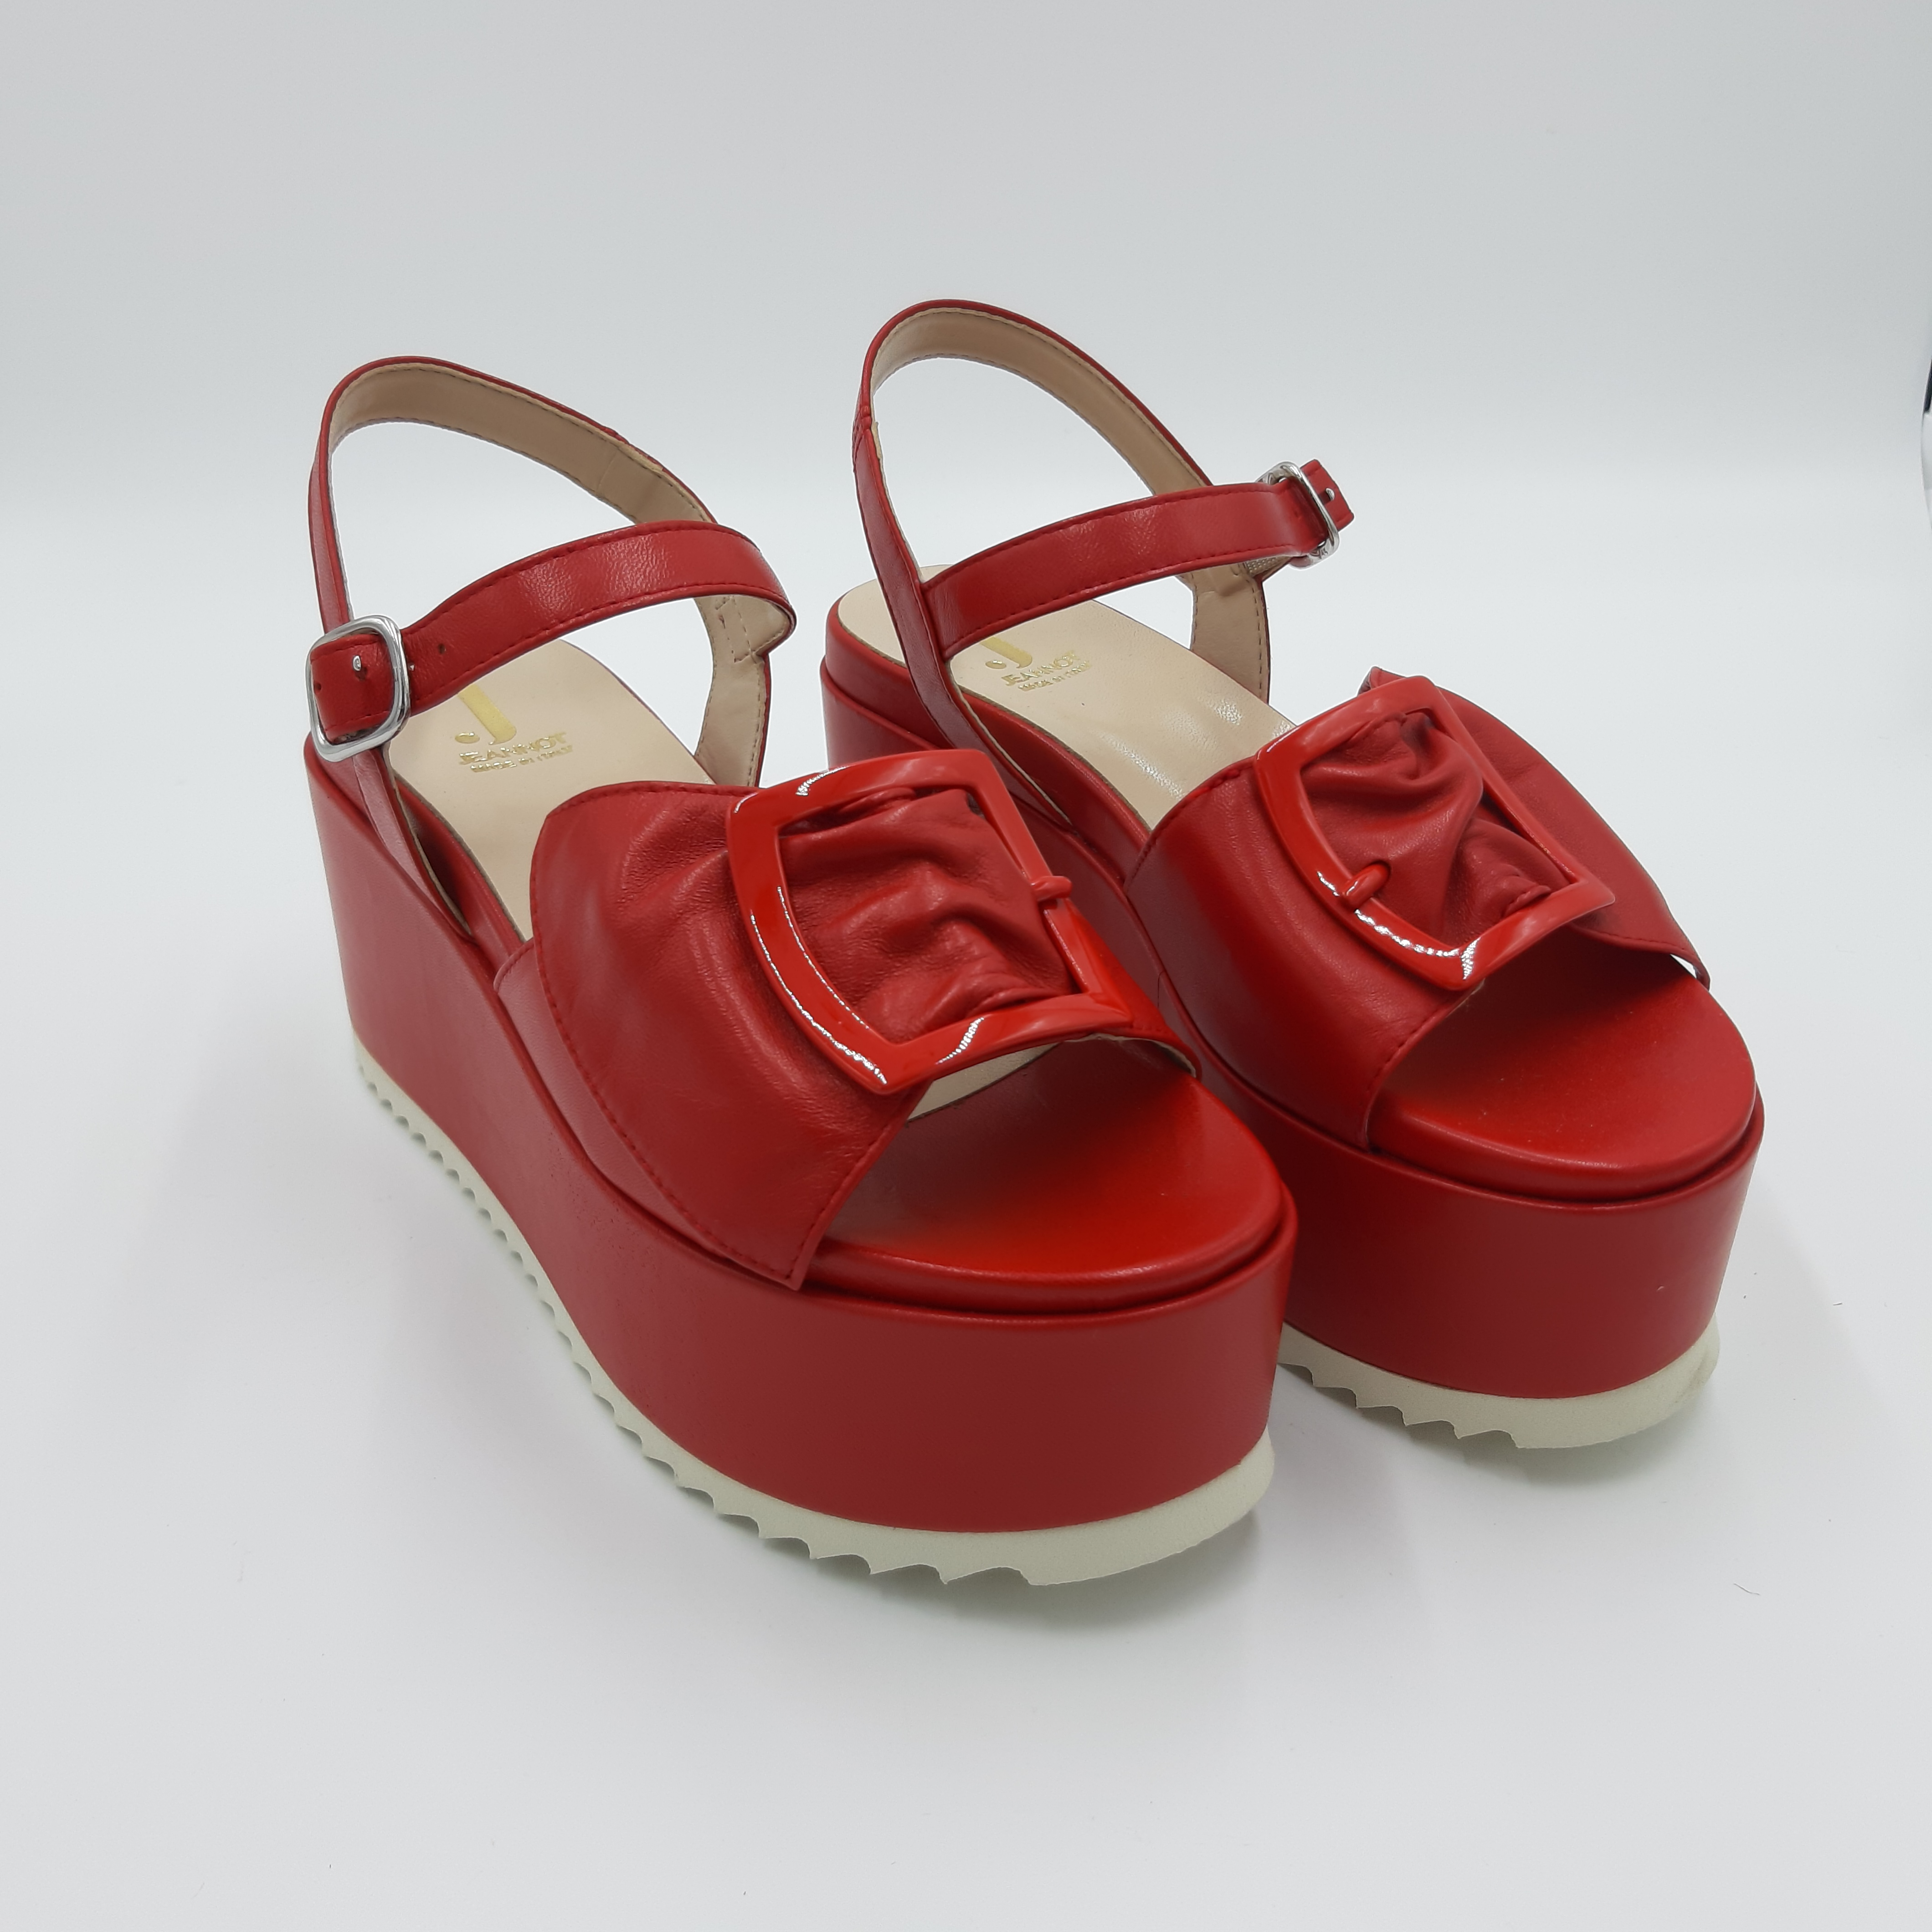 Sandali zeppa alta rossi Jeannot